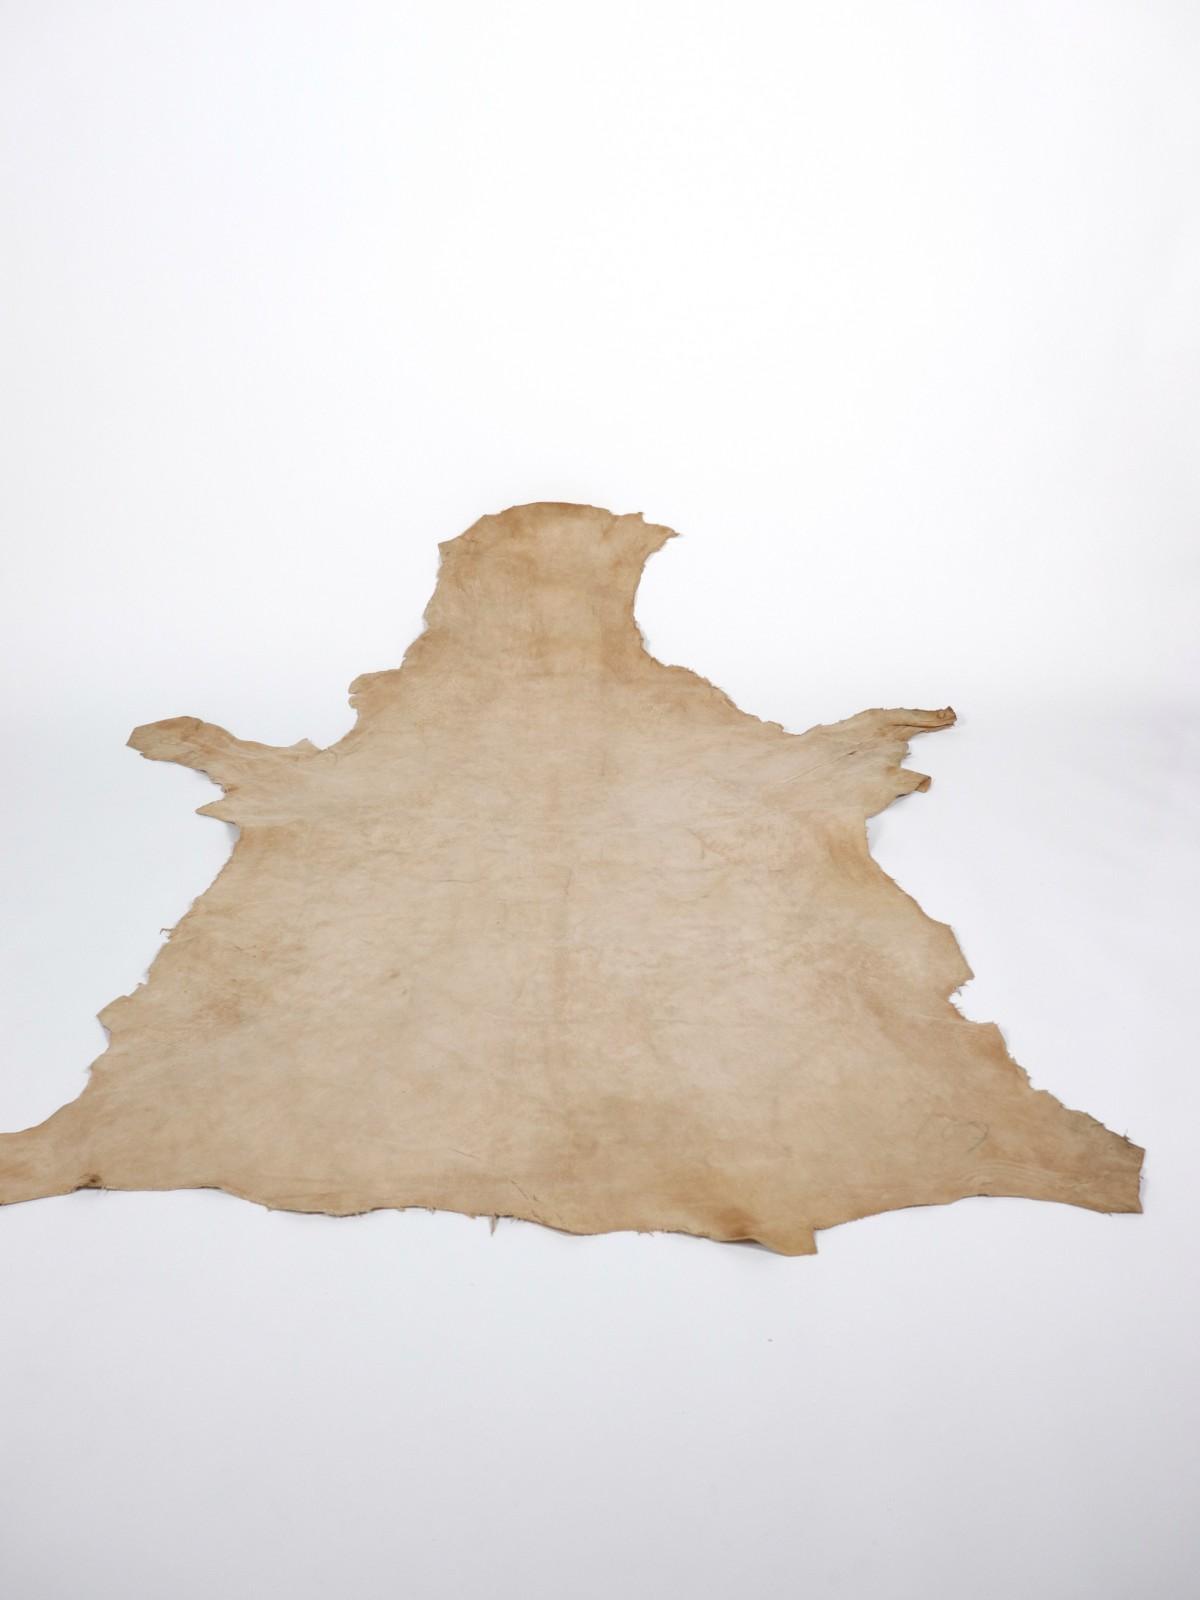 raw leather, cow skin, europe